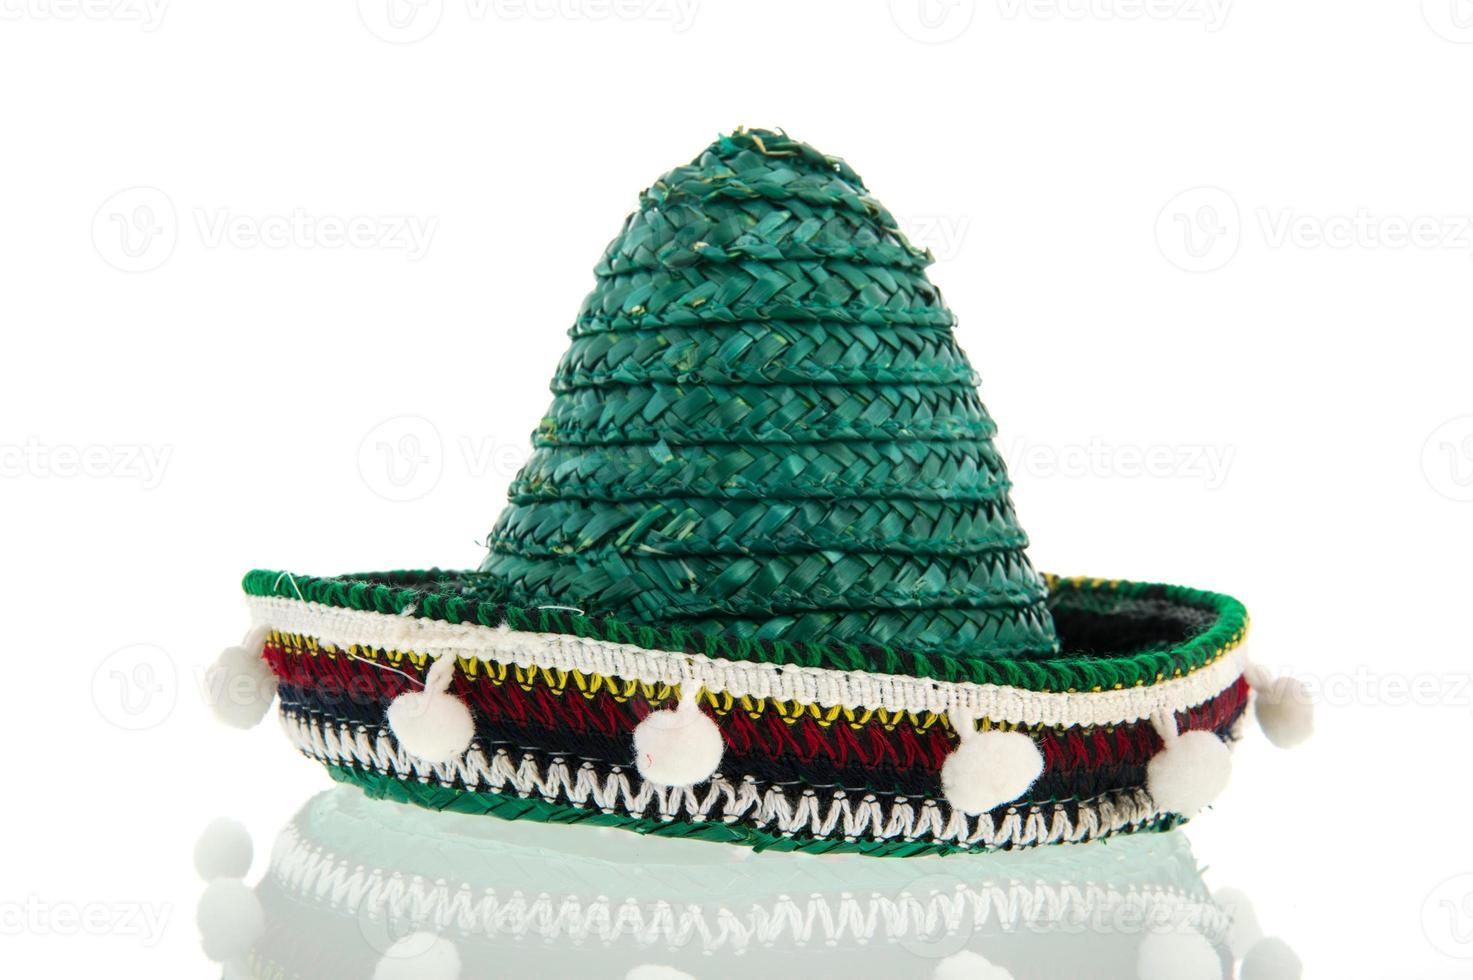 grüner Sombrero foto